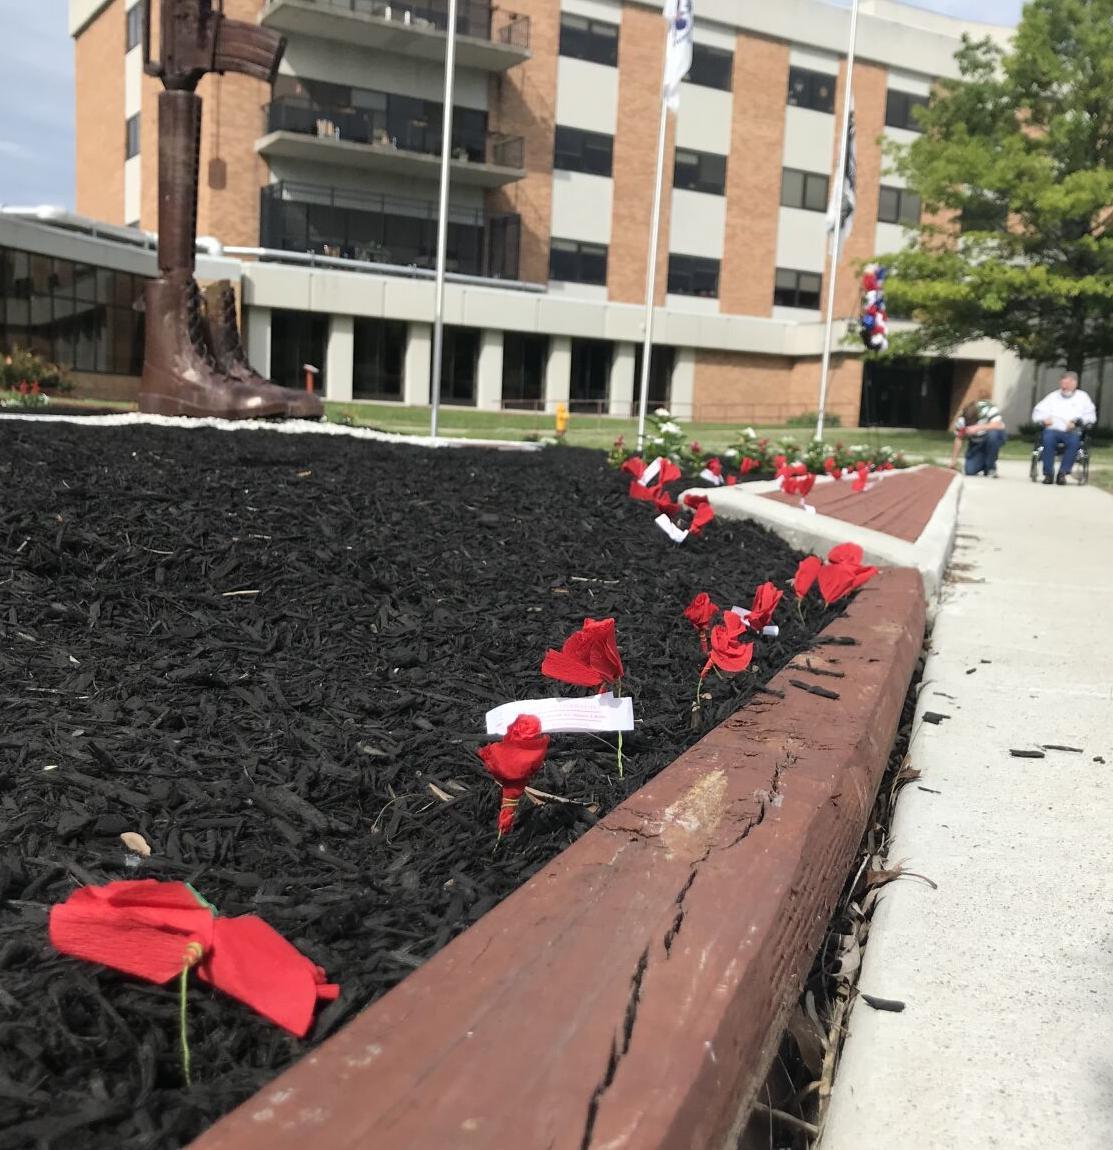 5/31/21 Veterans Day, Poppies